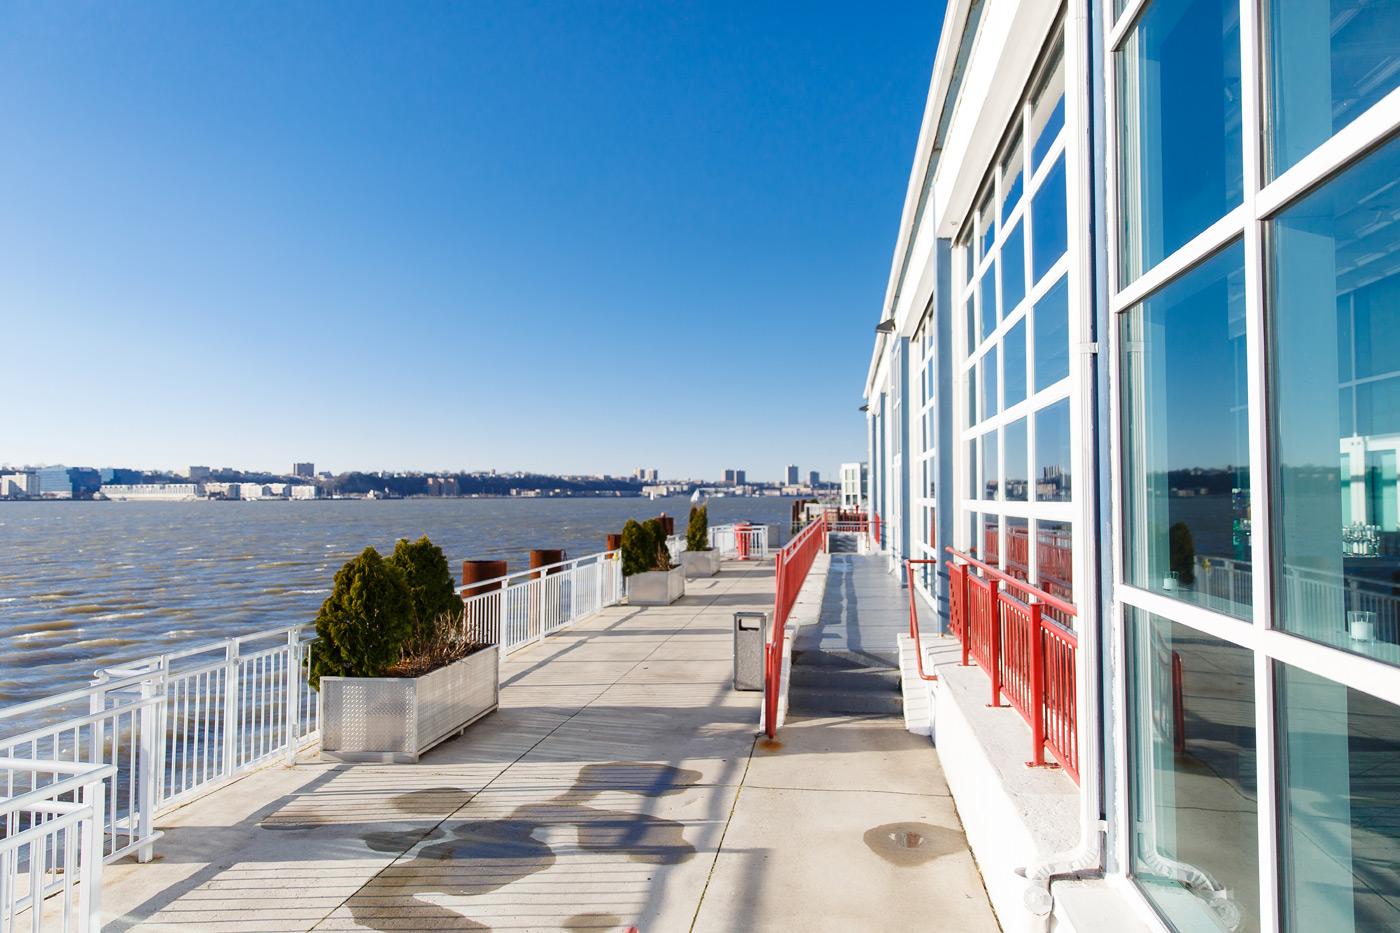 Pier Sixty Veranda, Hudson River Views, Outdoor space